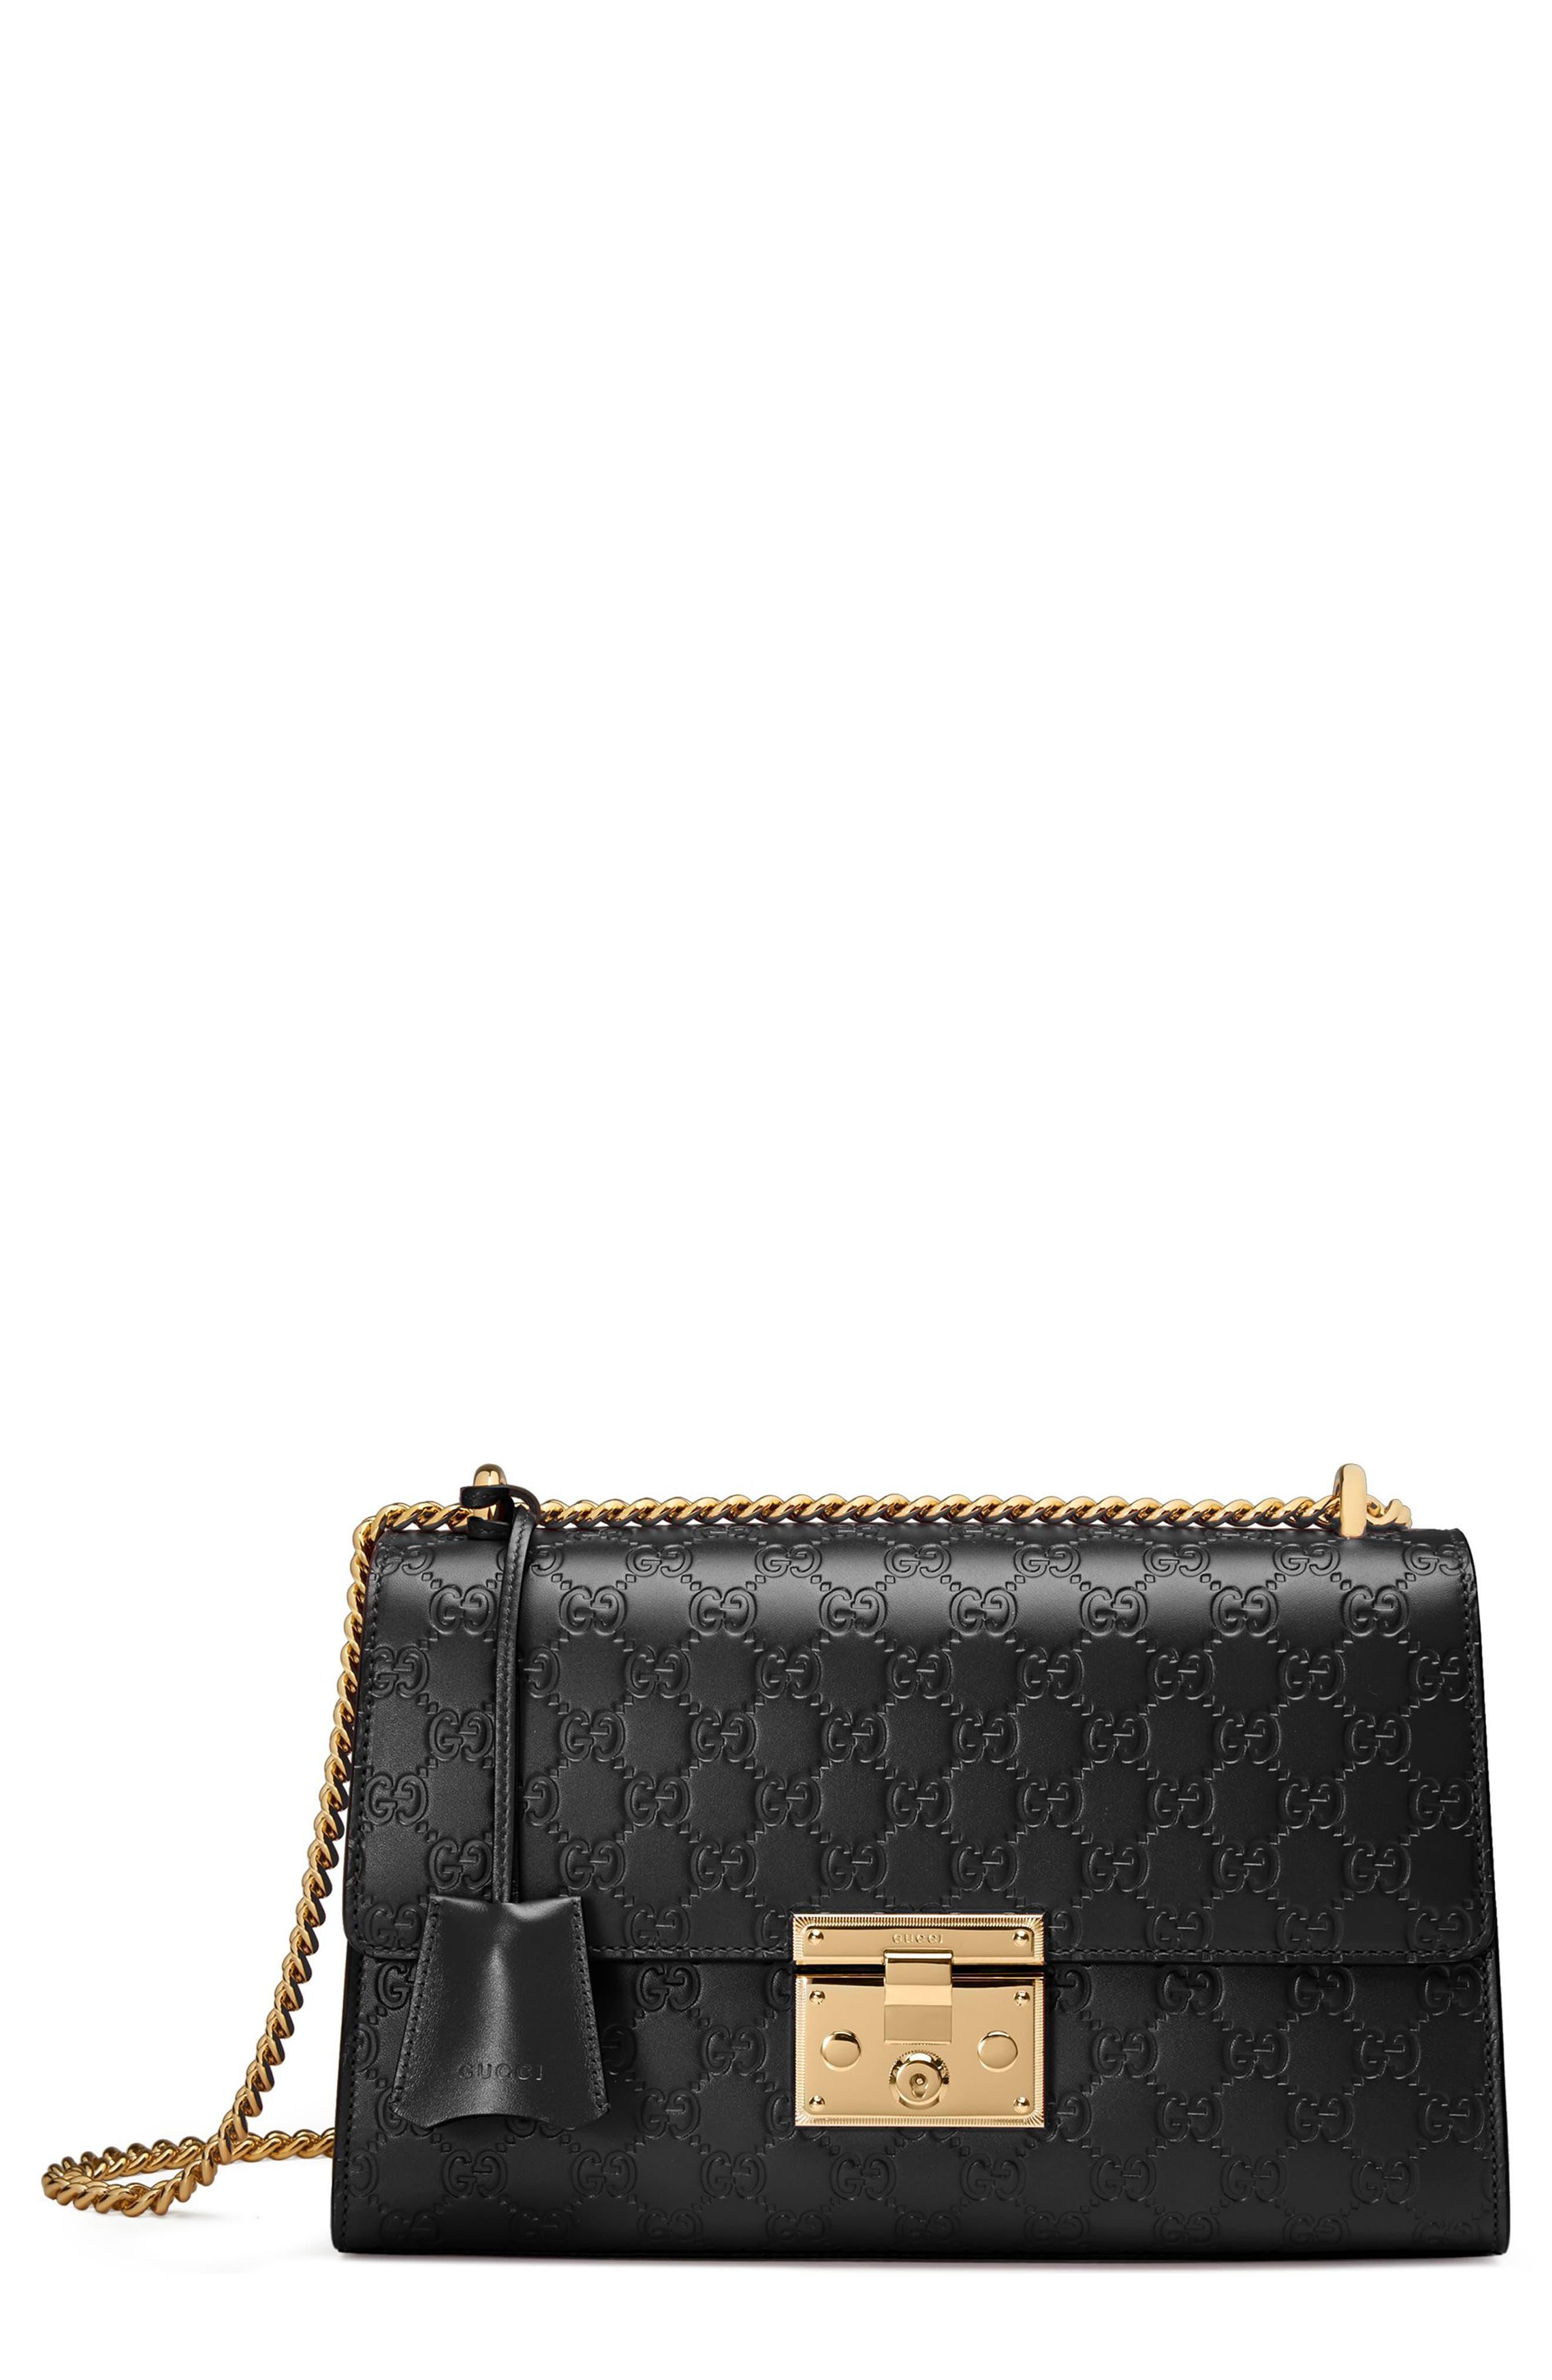 Medium Padlock Signature Leather Shoulder Bag,                             Main thumbnail 1, color,                             NERO